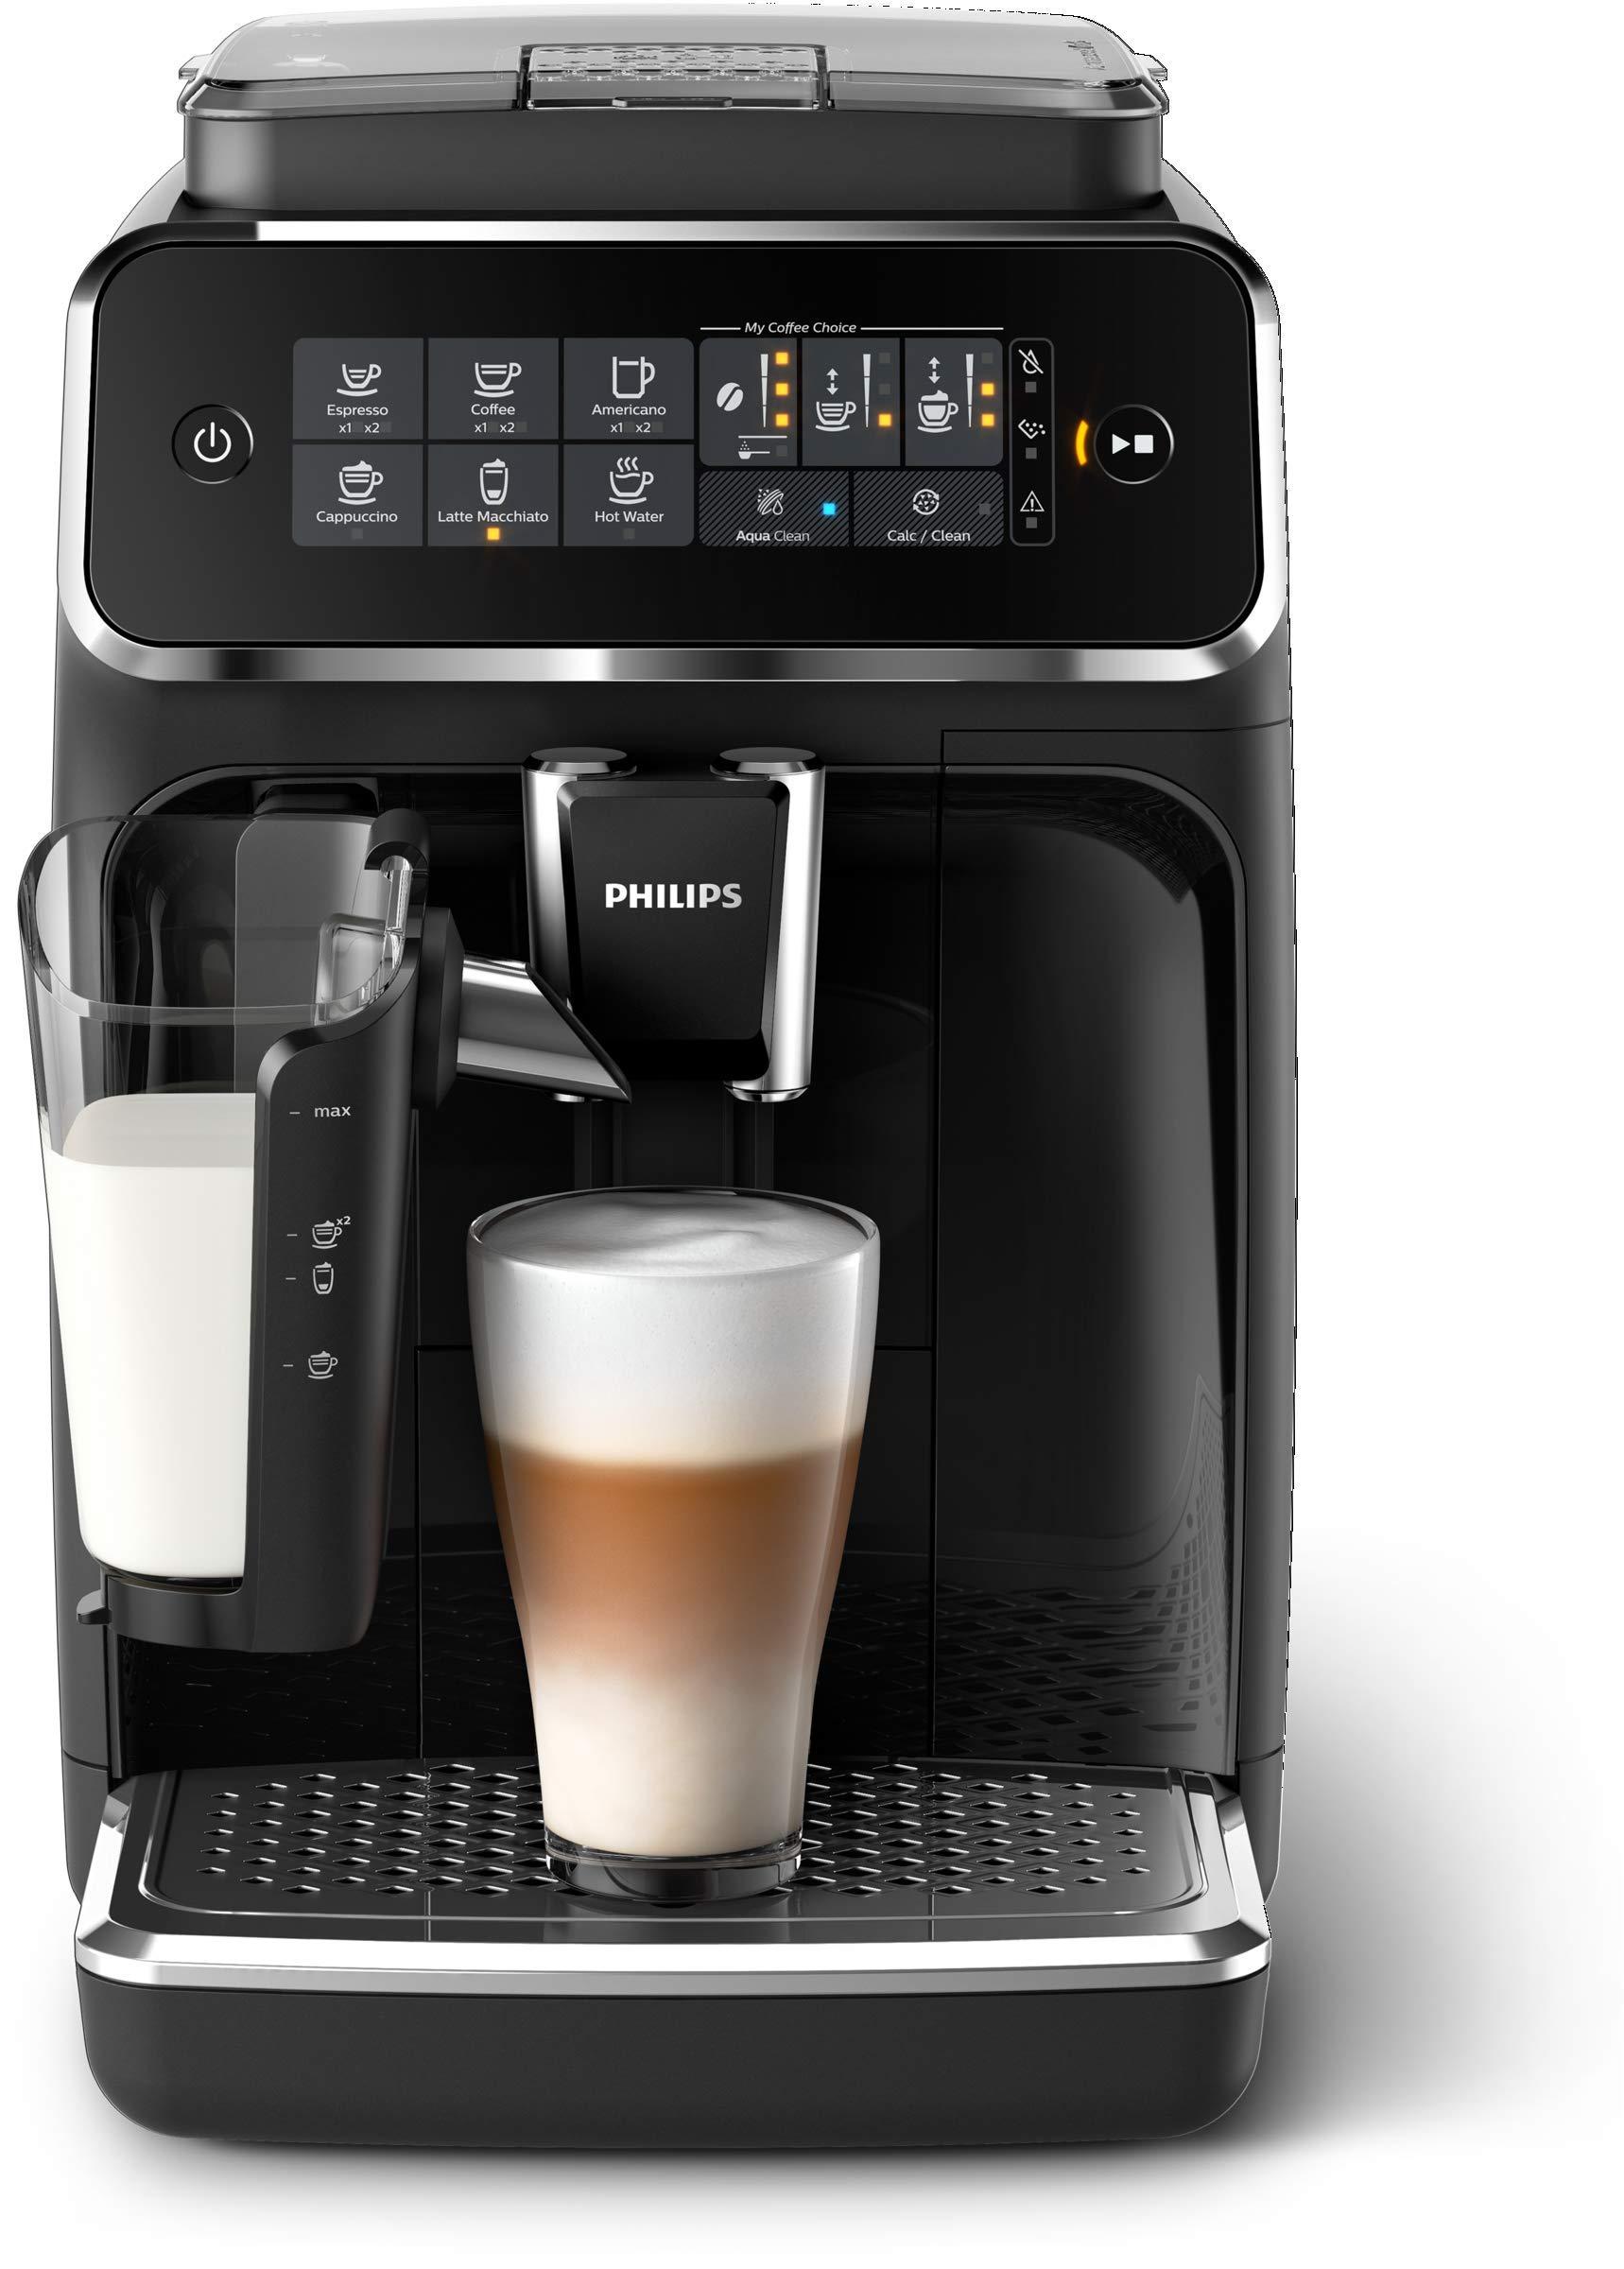 Philips 3200 Series Automatic Espresso Machine